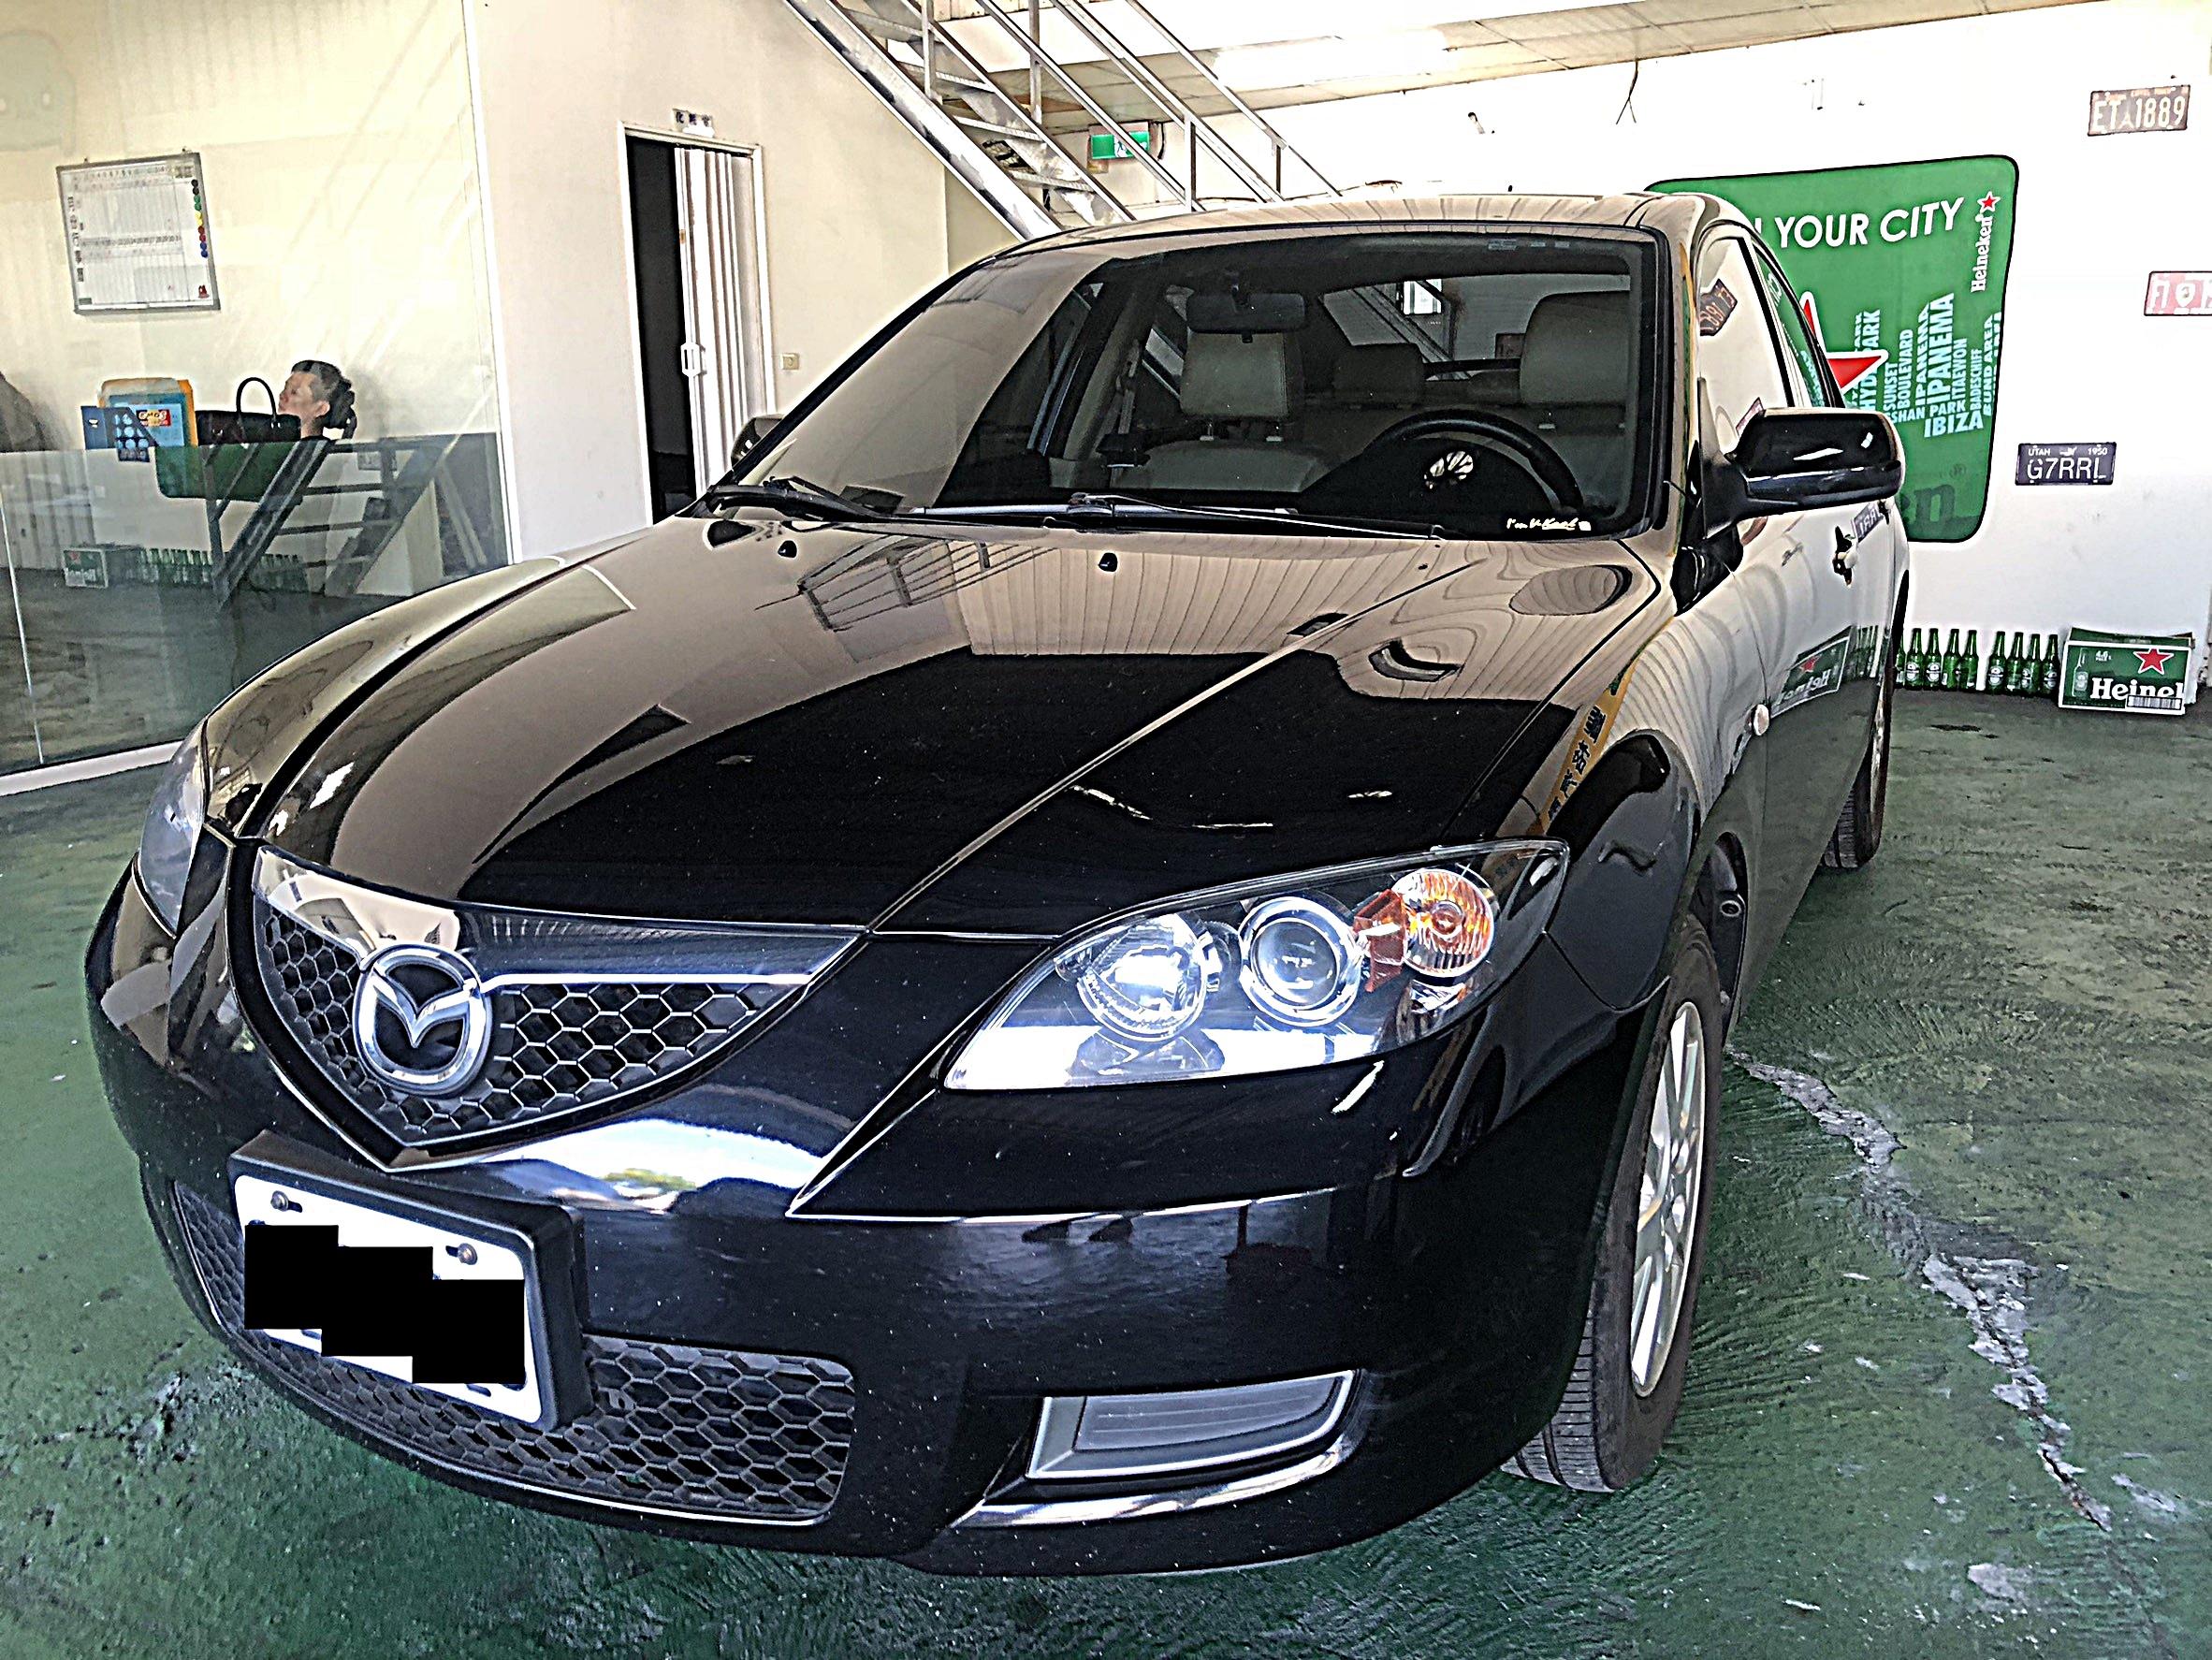 2009 Mazda 馬自達 3